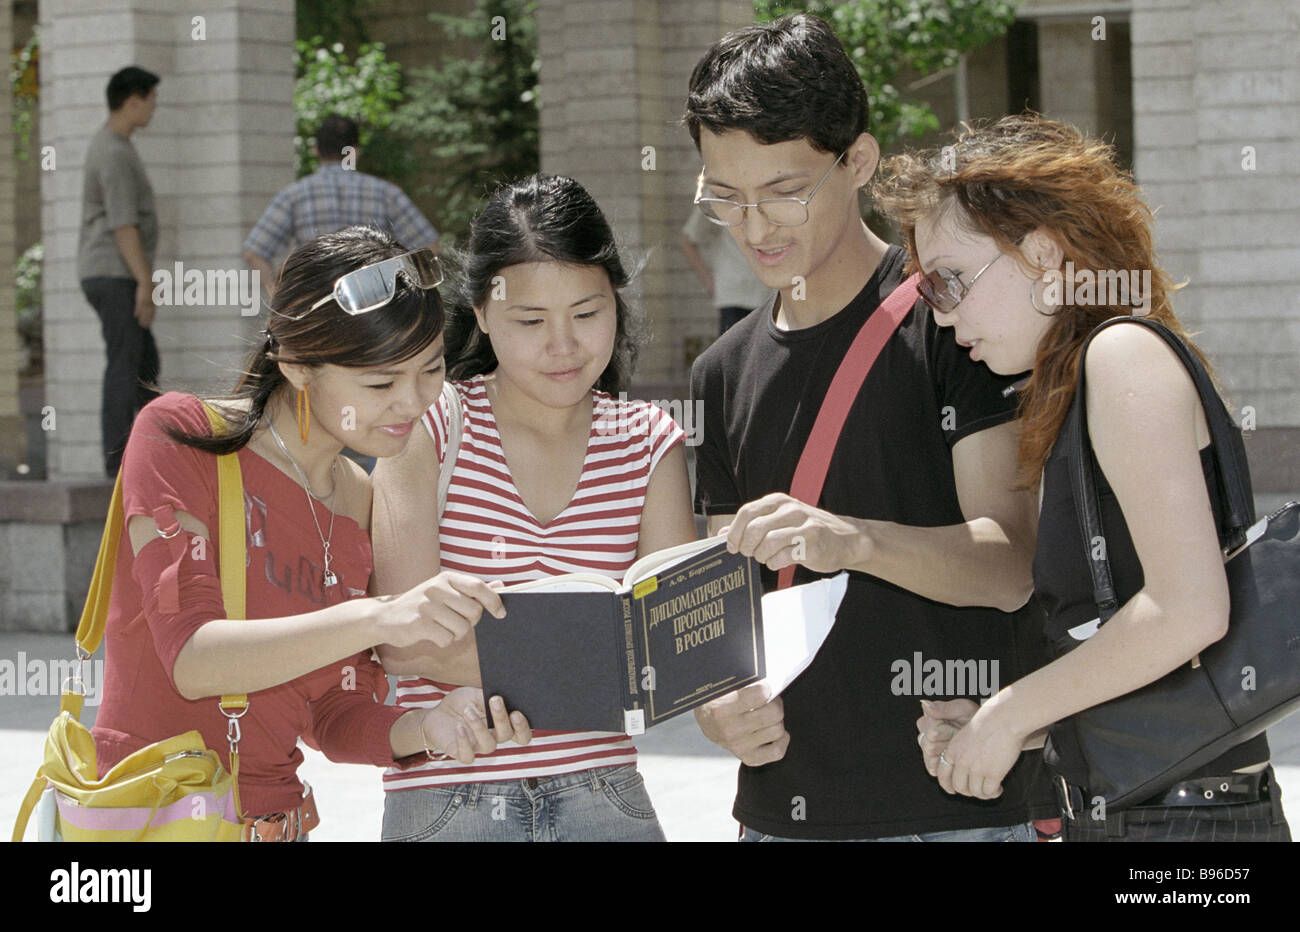 Students of International Relations Department of Russian Kyrgyz Slav University - Stock Image